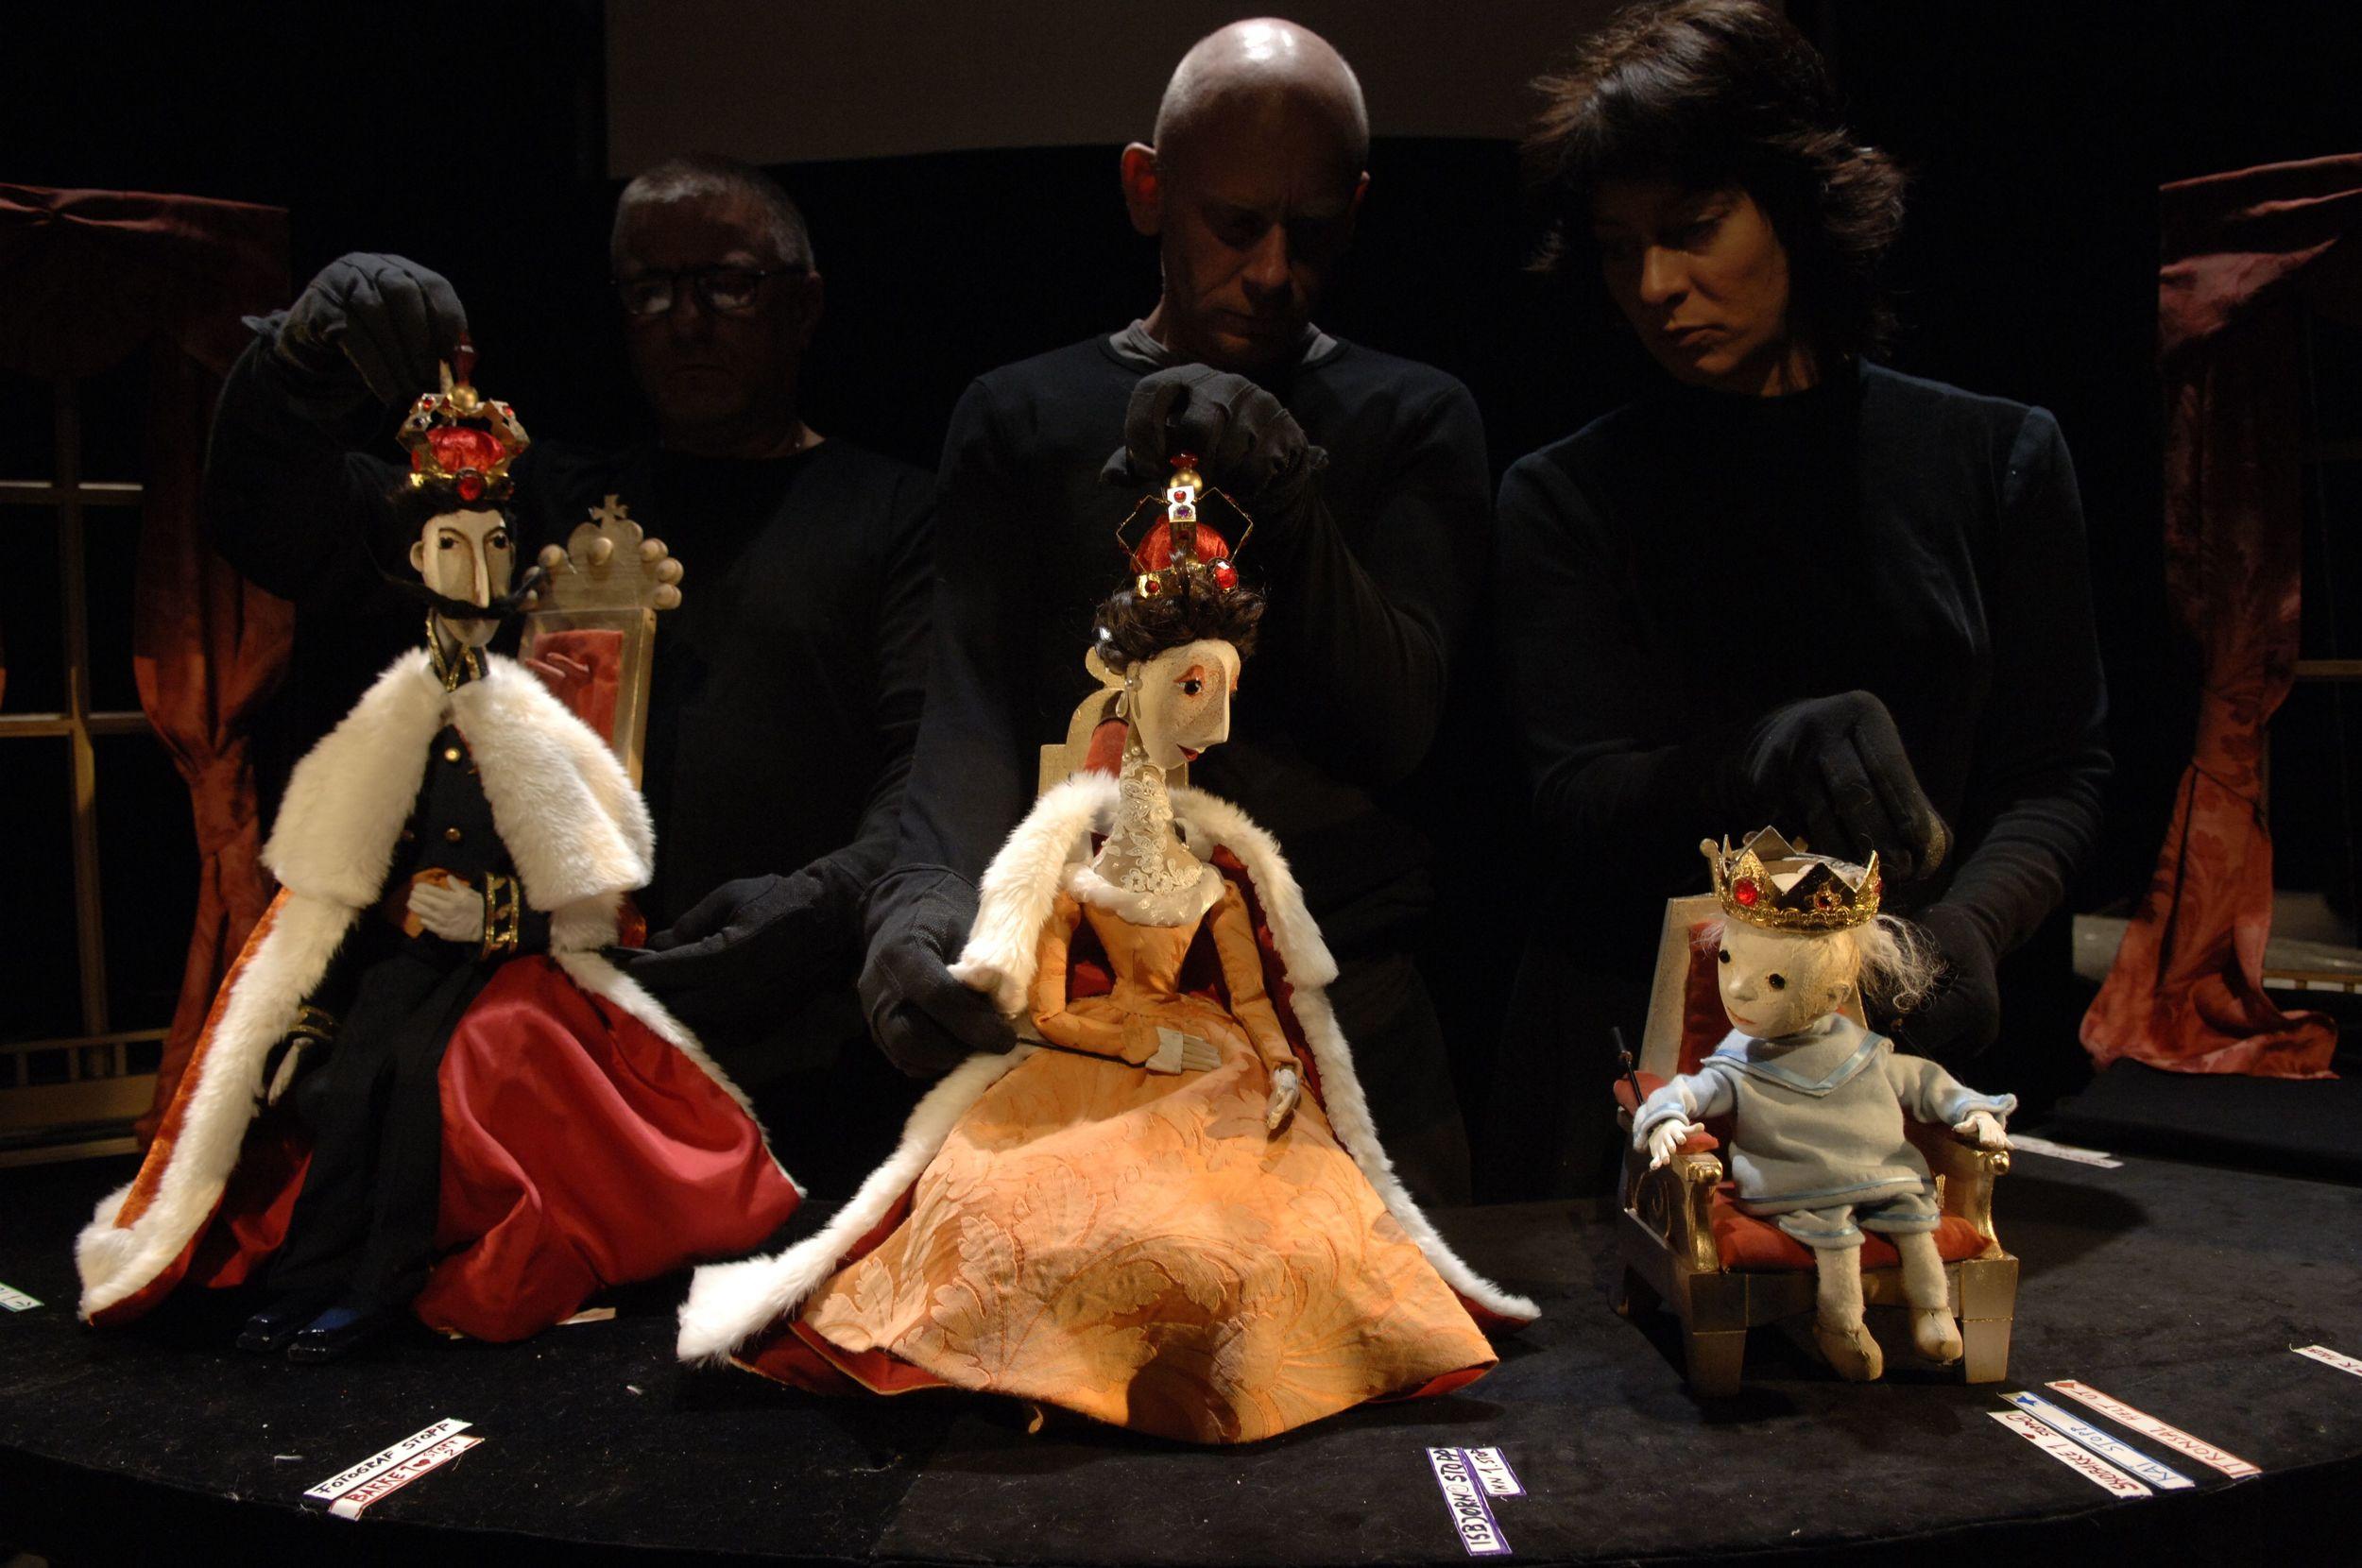 Nina Bendiksen. Bjørn Myrholdt. Ljudmil Nikolov . Why the Royalties doesn´t wear a crown. Story: Princess Märtha Louise. Directing, Scenography & Puppets: Lisbeth Narud